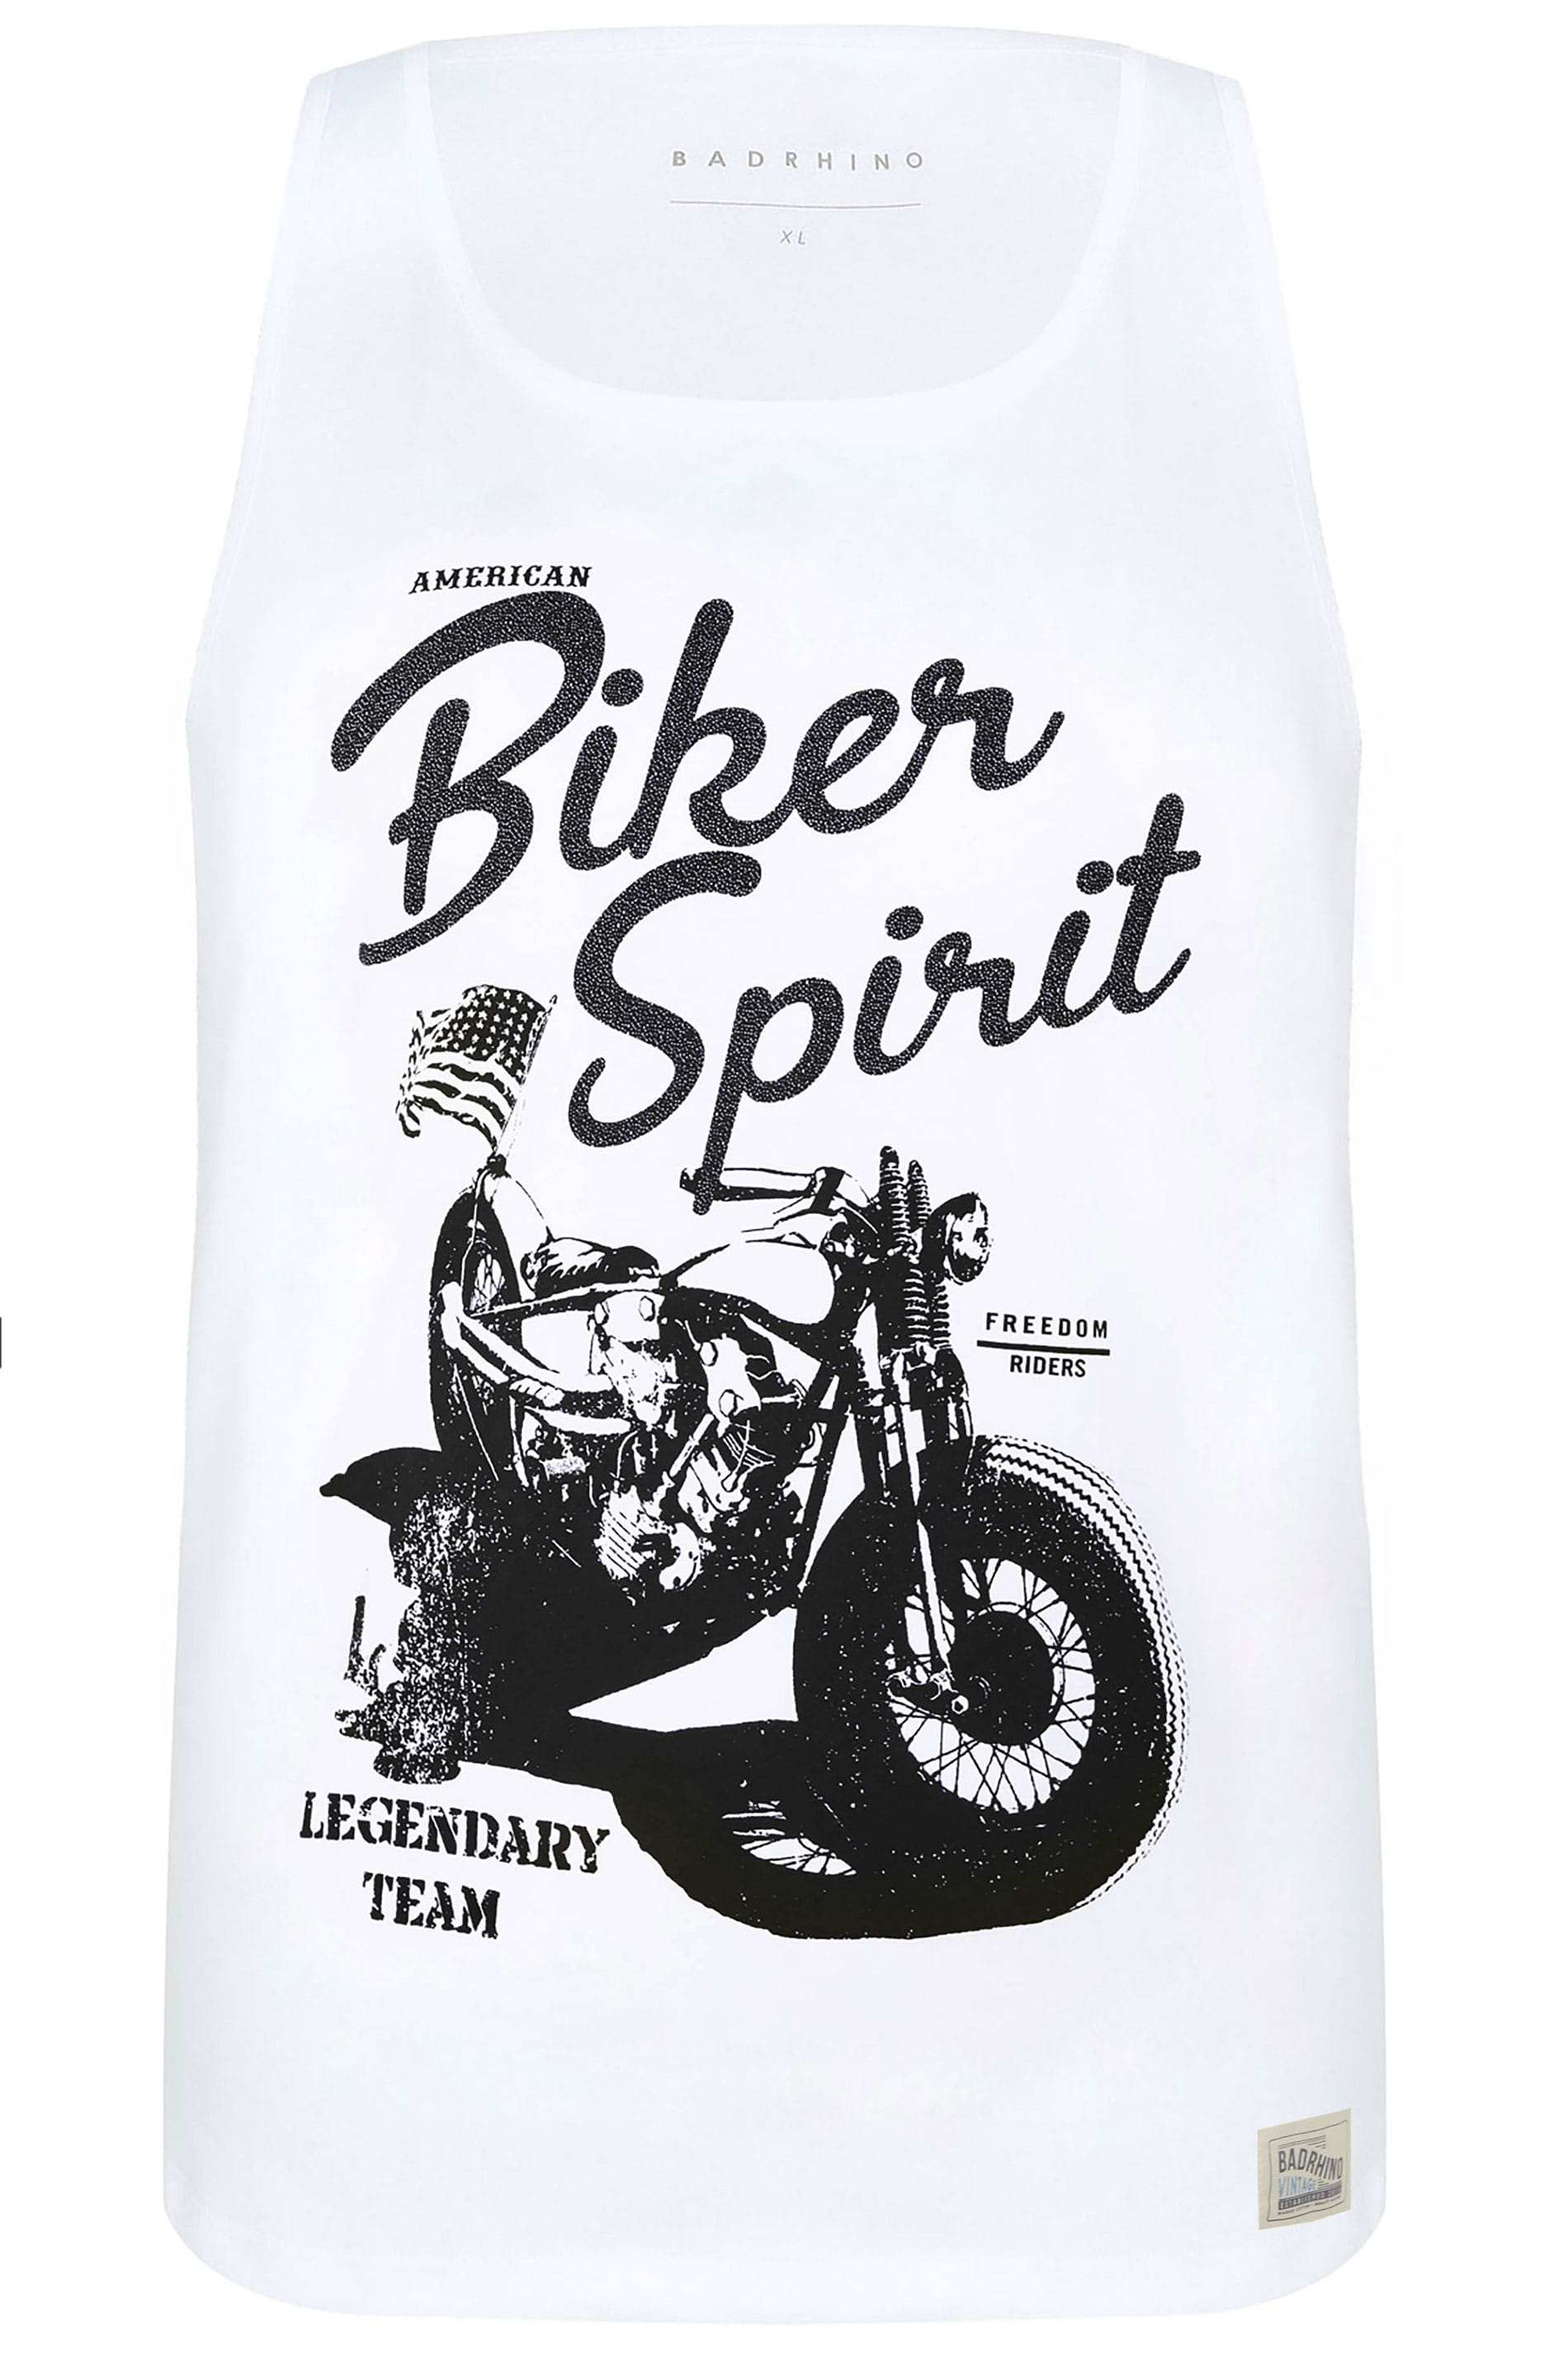 BadRhino White 'Biker Spirit' Slogan Vest Top